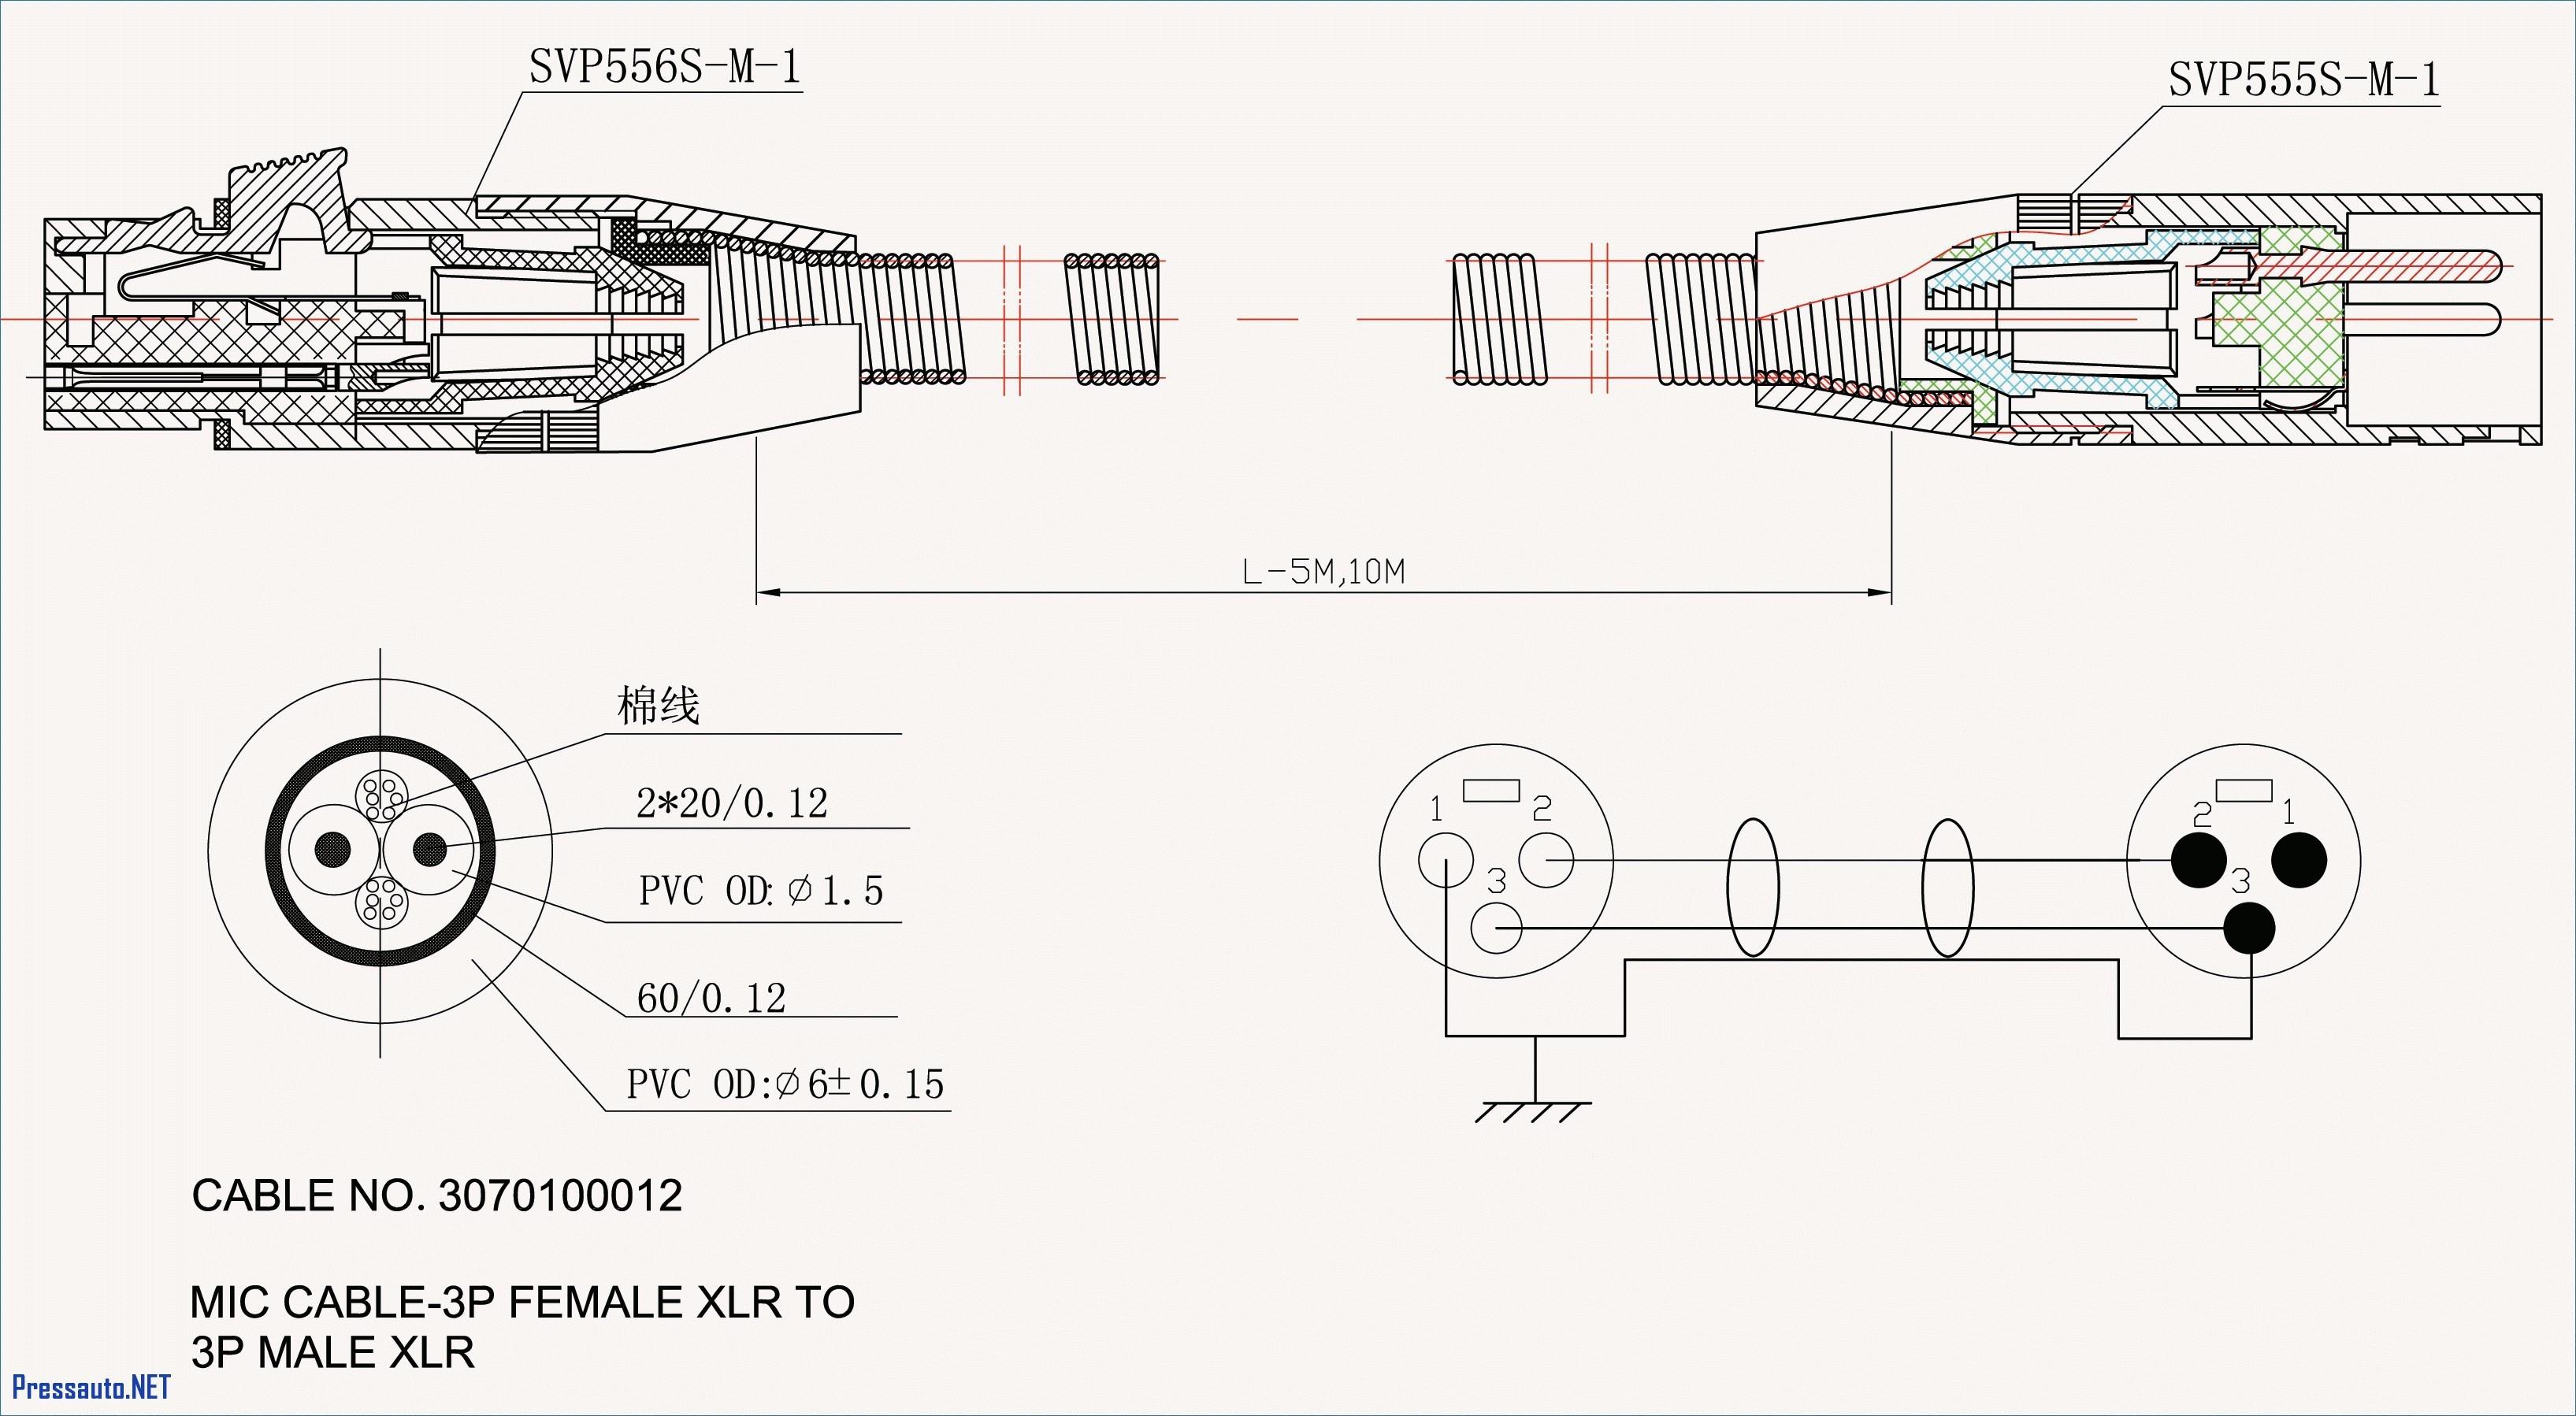 7 Way Trailer Plug Wiring Diagram Gmc New Wiring Diagram For Gmc Trailer Plug Best Yukon Trailer Wiring